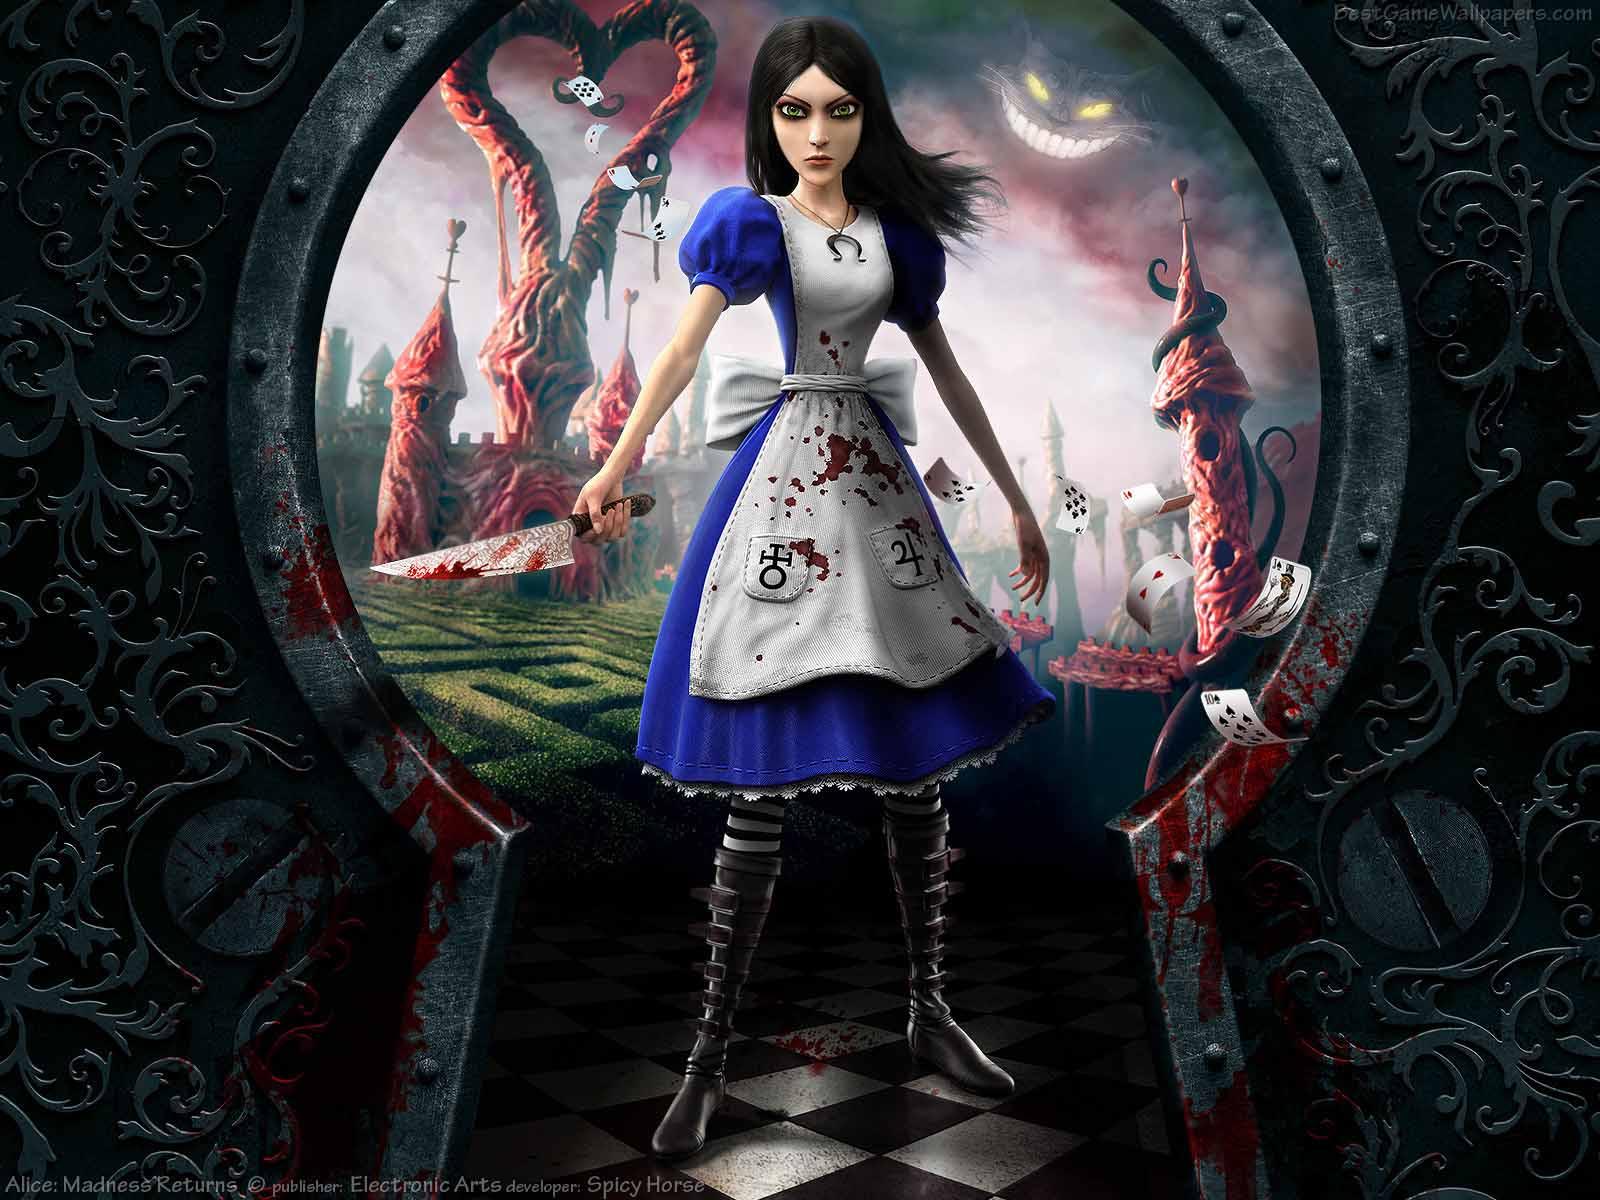 Mad Alice